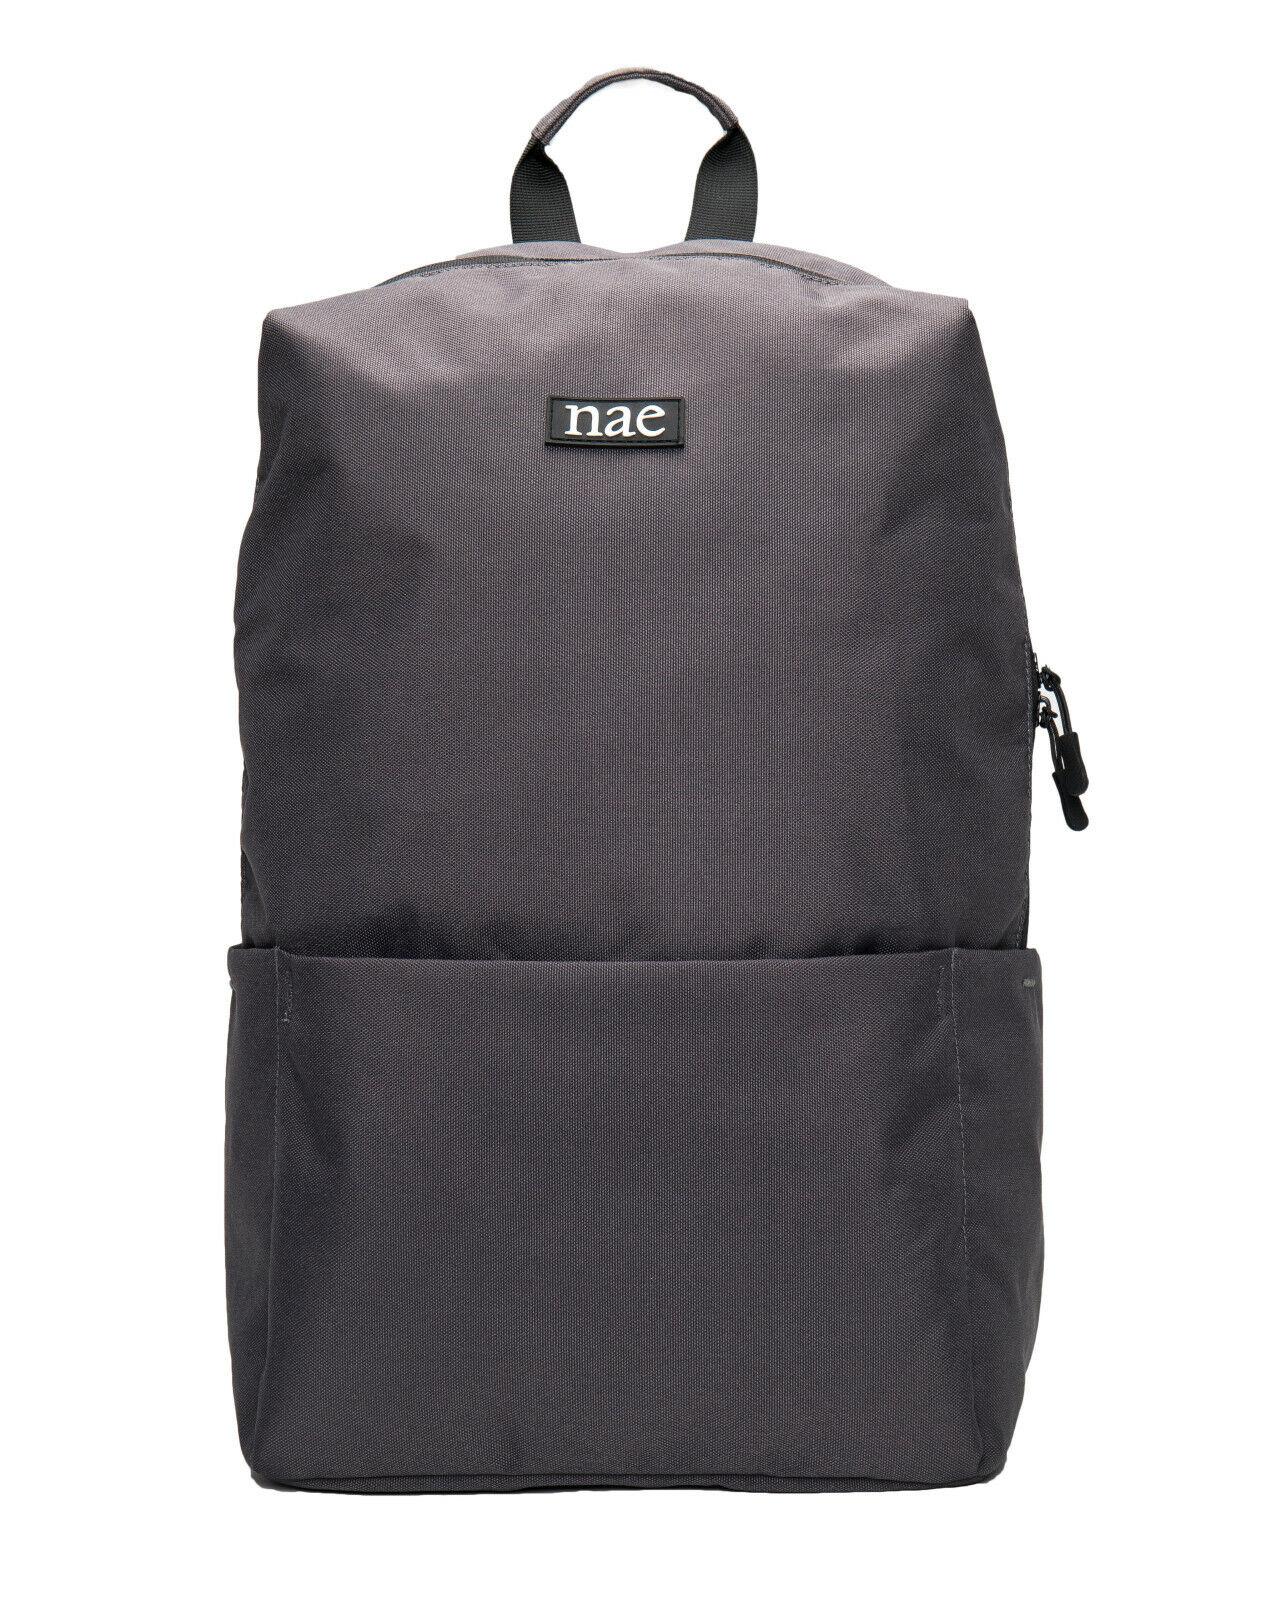 Vegan bag adjustable on recycled PET resistant with laptop sleeve pocket &...